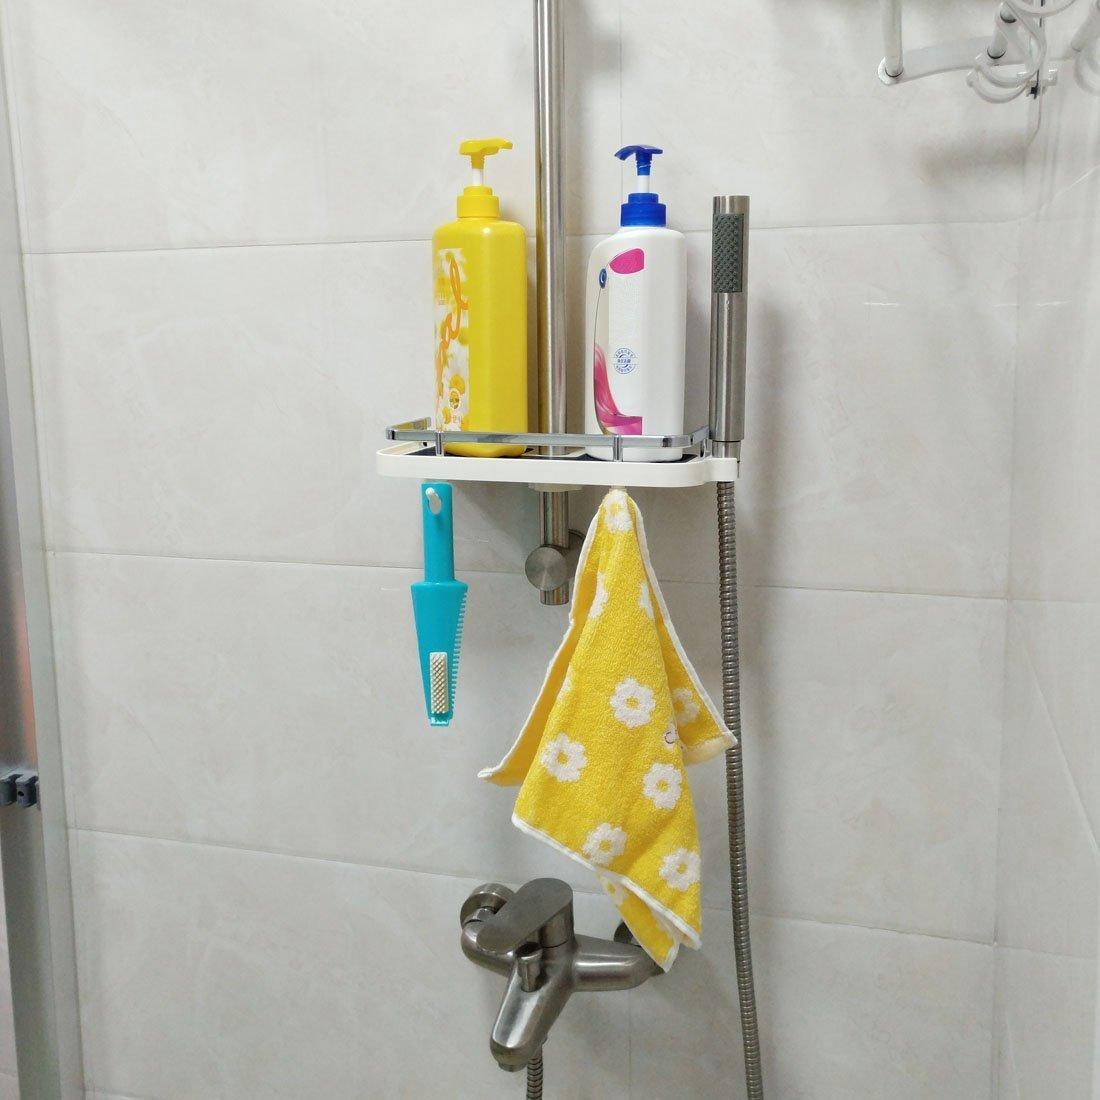 Kunststoff Dusche Caddy Regal Badezimmer Tablett Rack Bad